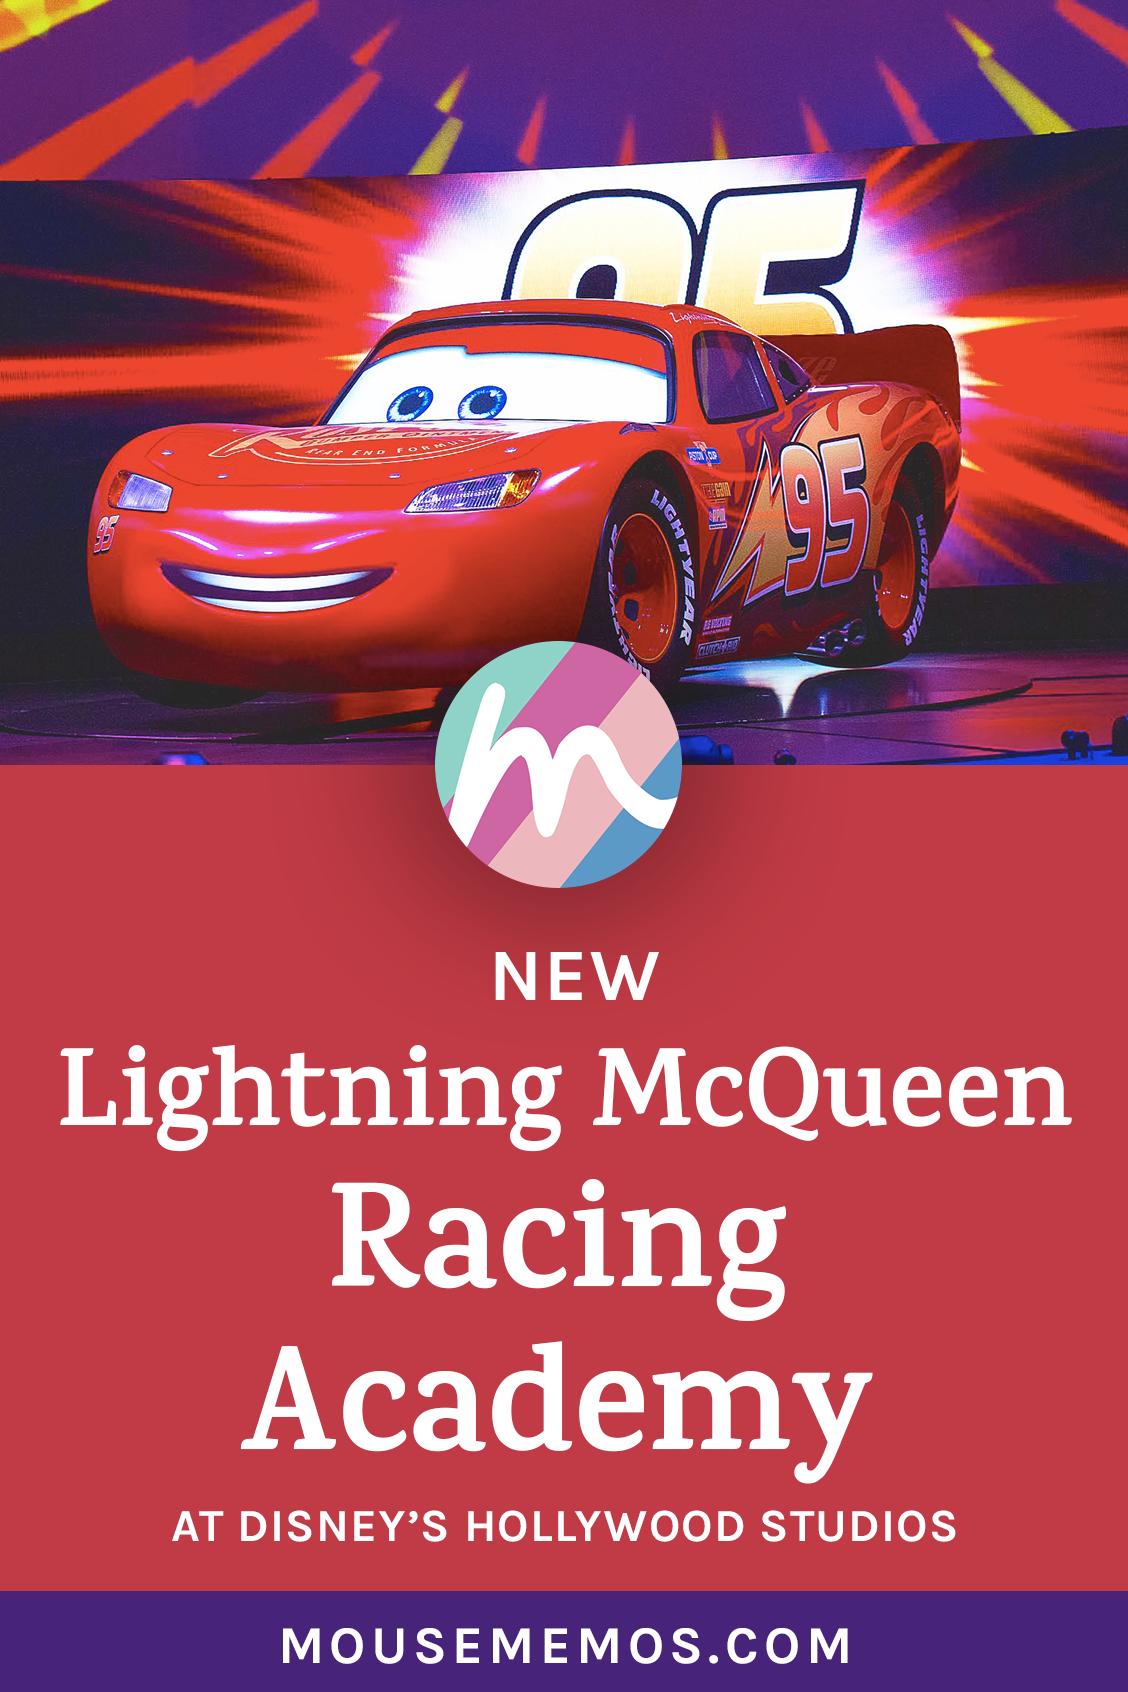 New Lighting Mcqueen S Racing Academy Opened March 31 Lighting Mcqueen S Racing Academy Invites Hollywood Studios Disney Disney World News Hollywood Studios